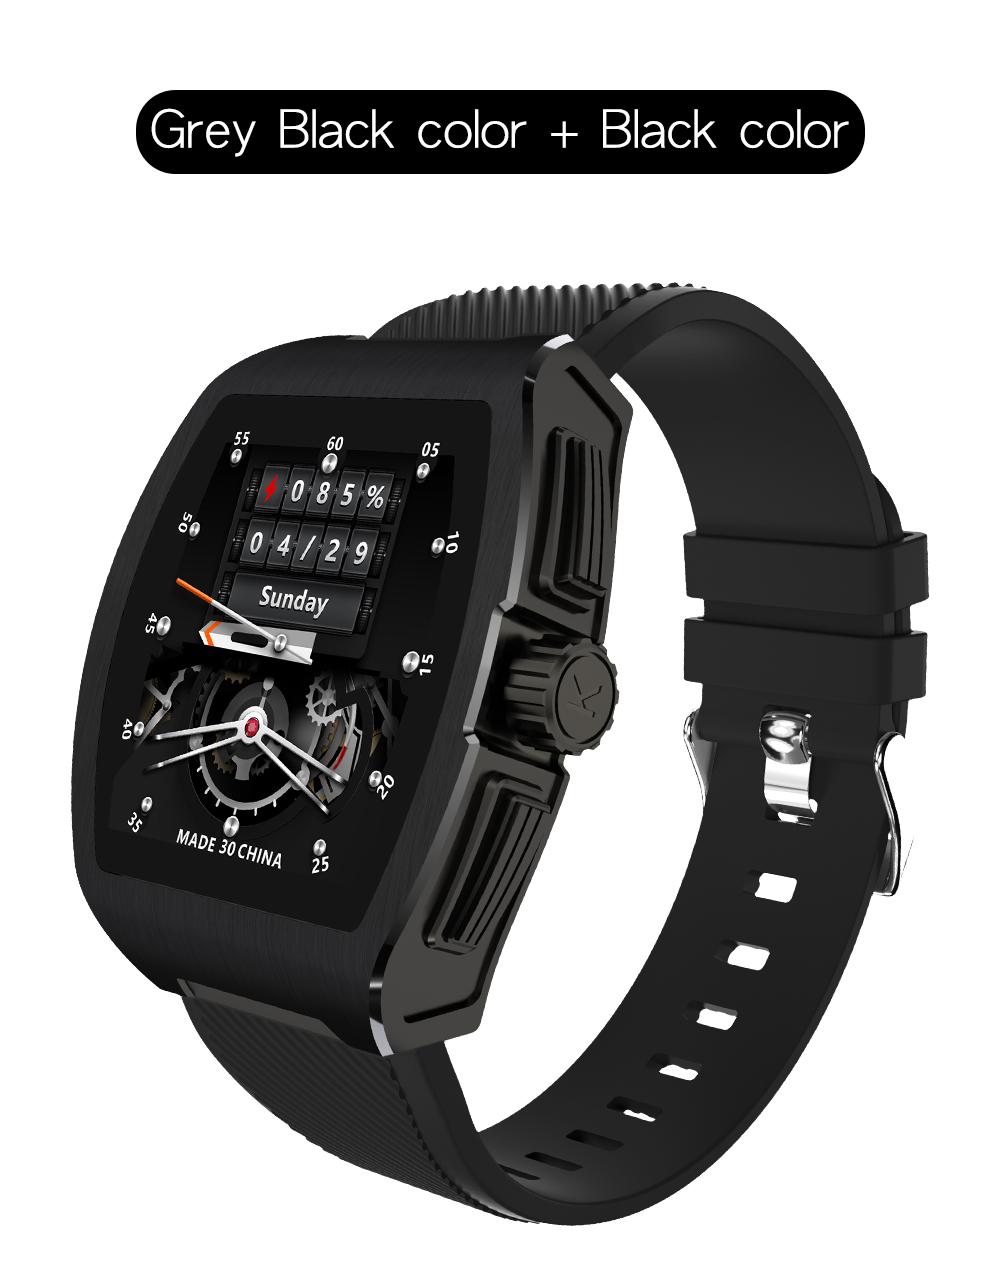 C1 Smart Bracelet Temperature Monitor Bluetooth Heart Rate Blood Pressure Smart Watche black